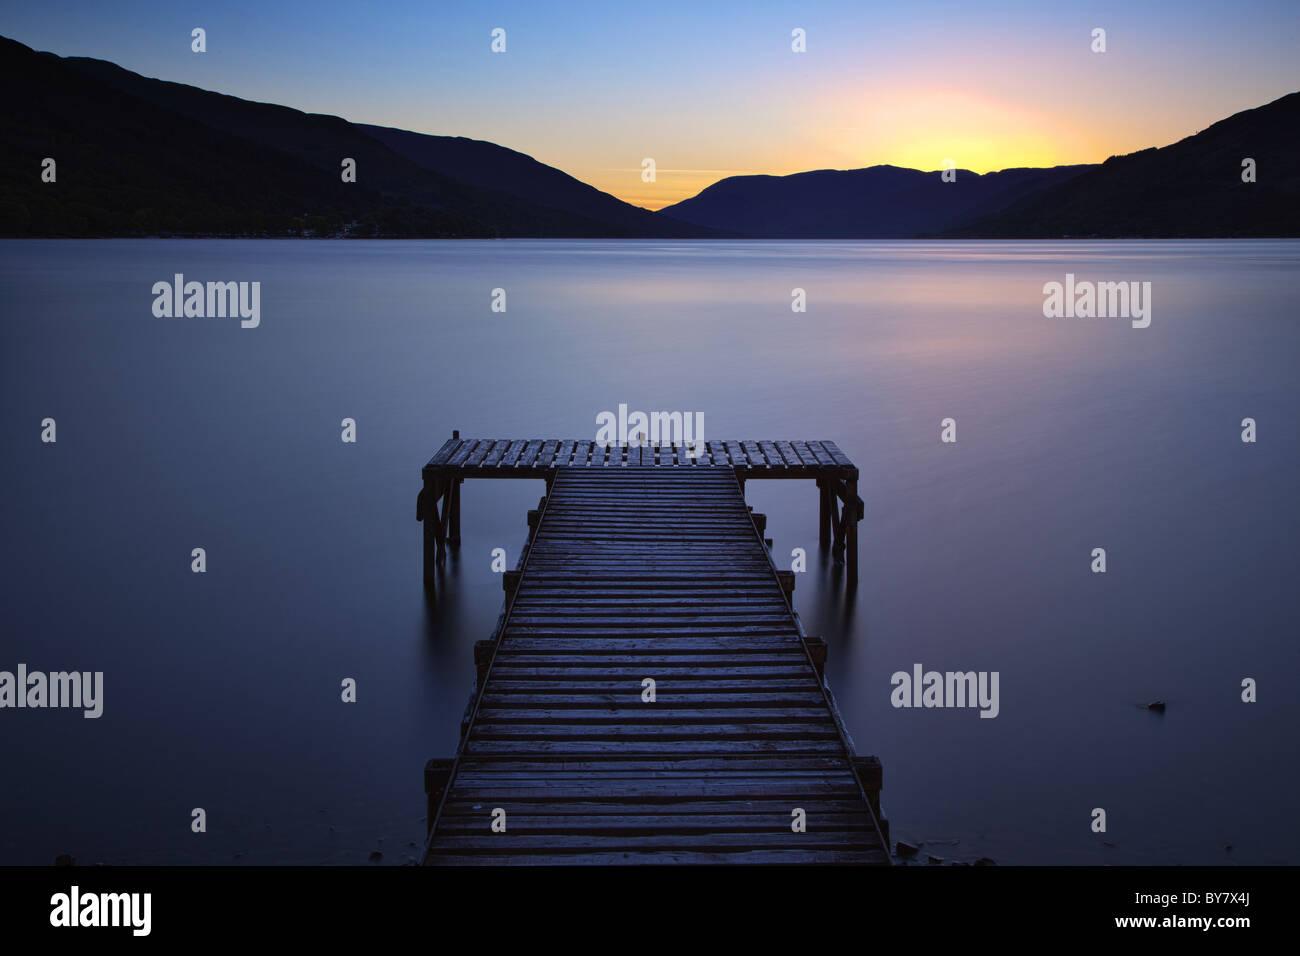 Loch Earn Jetty, St Fillians, Perthshire, Scotland - Stock Image